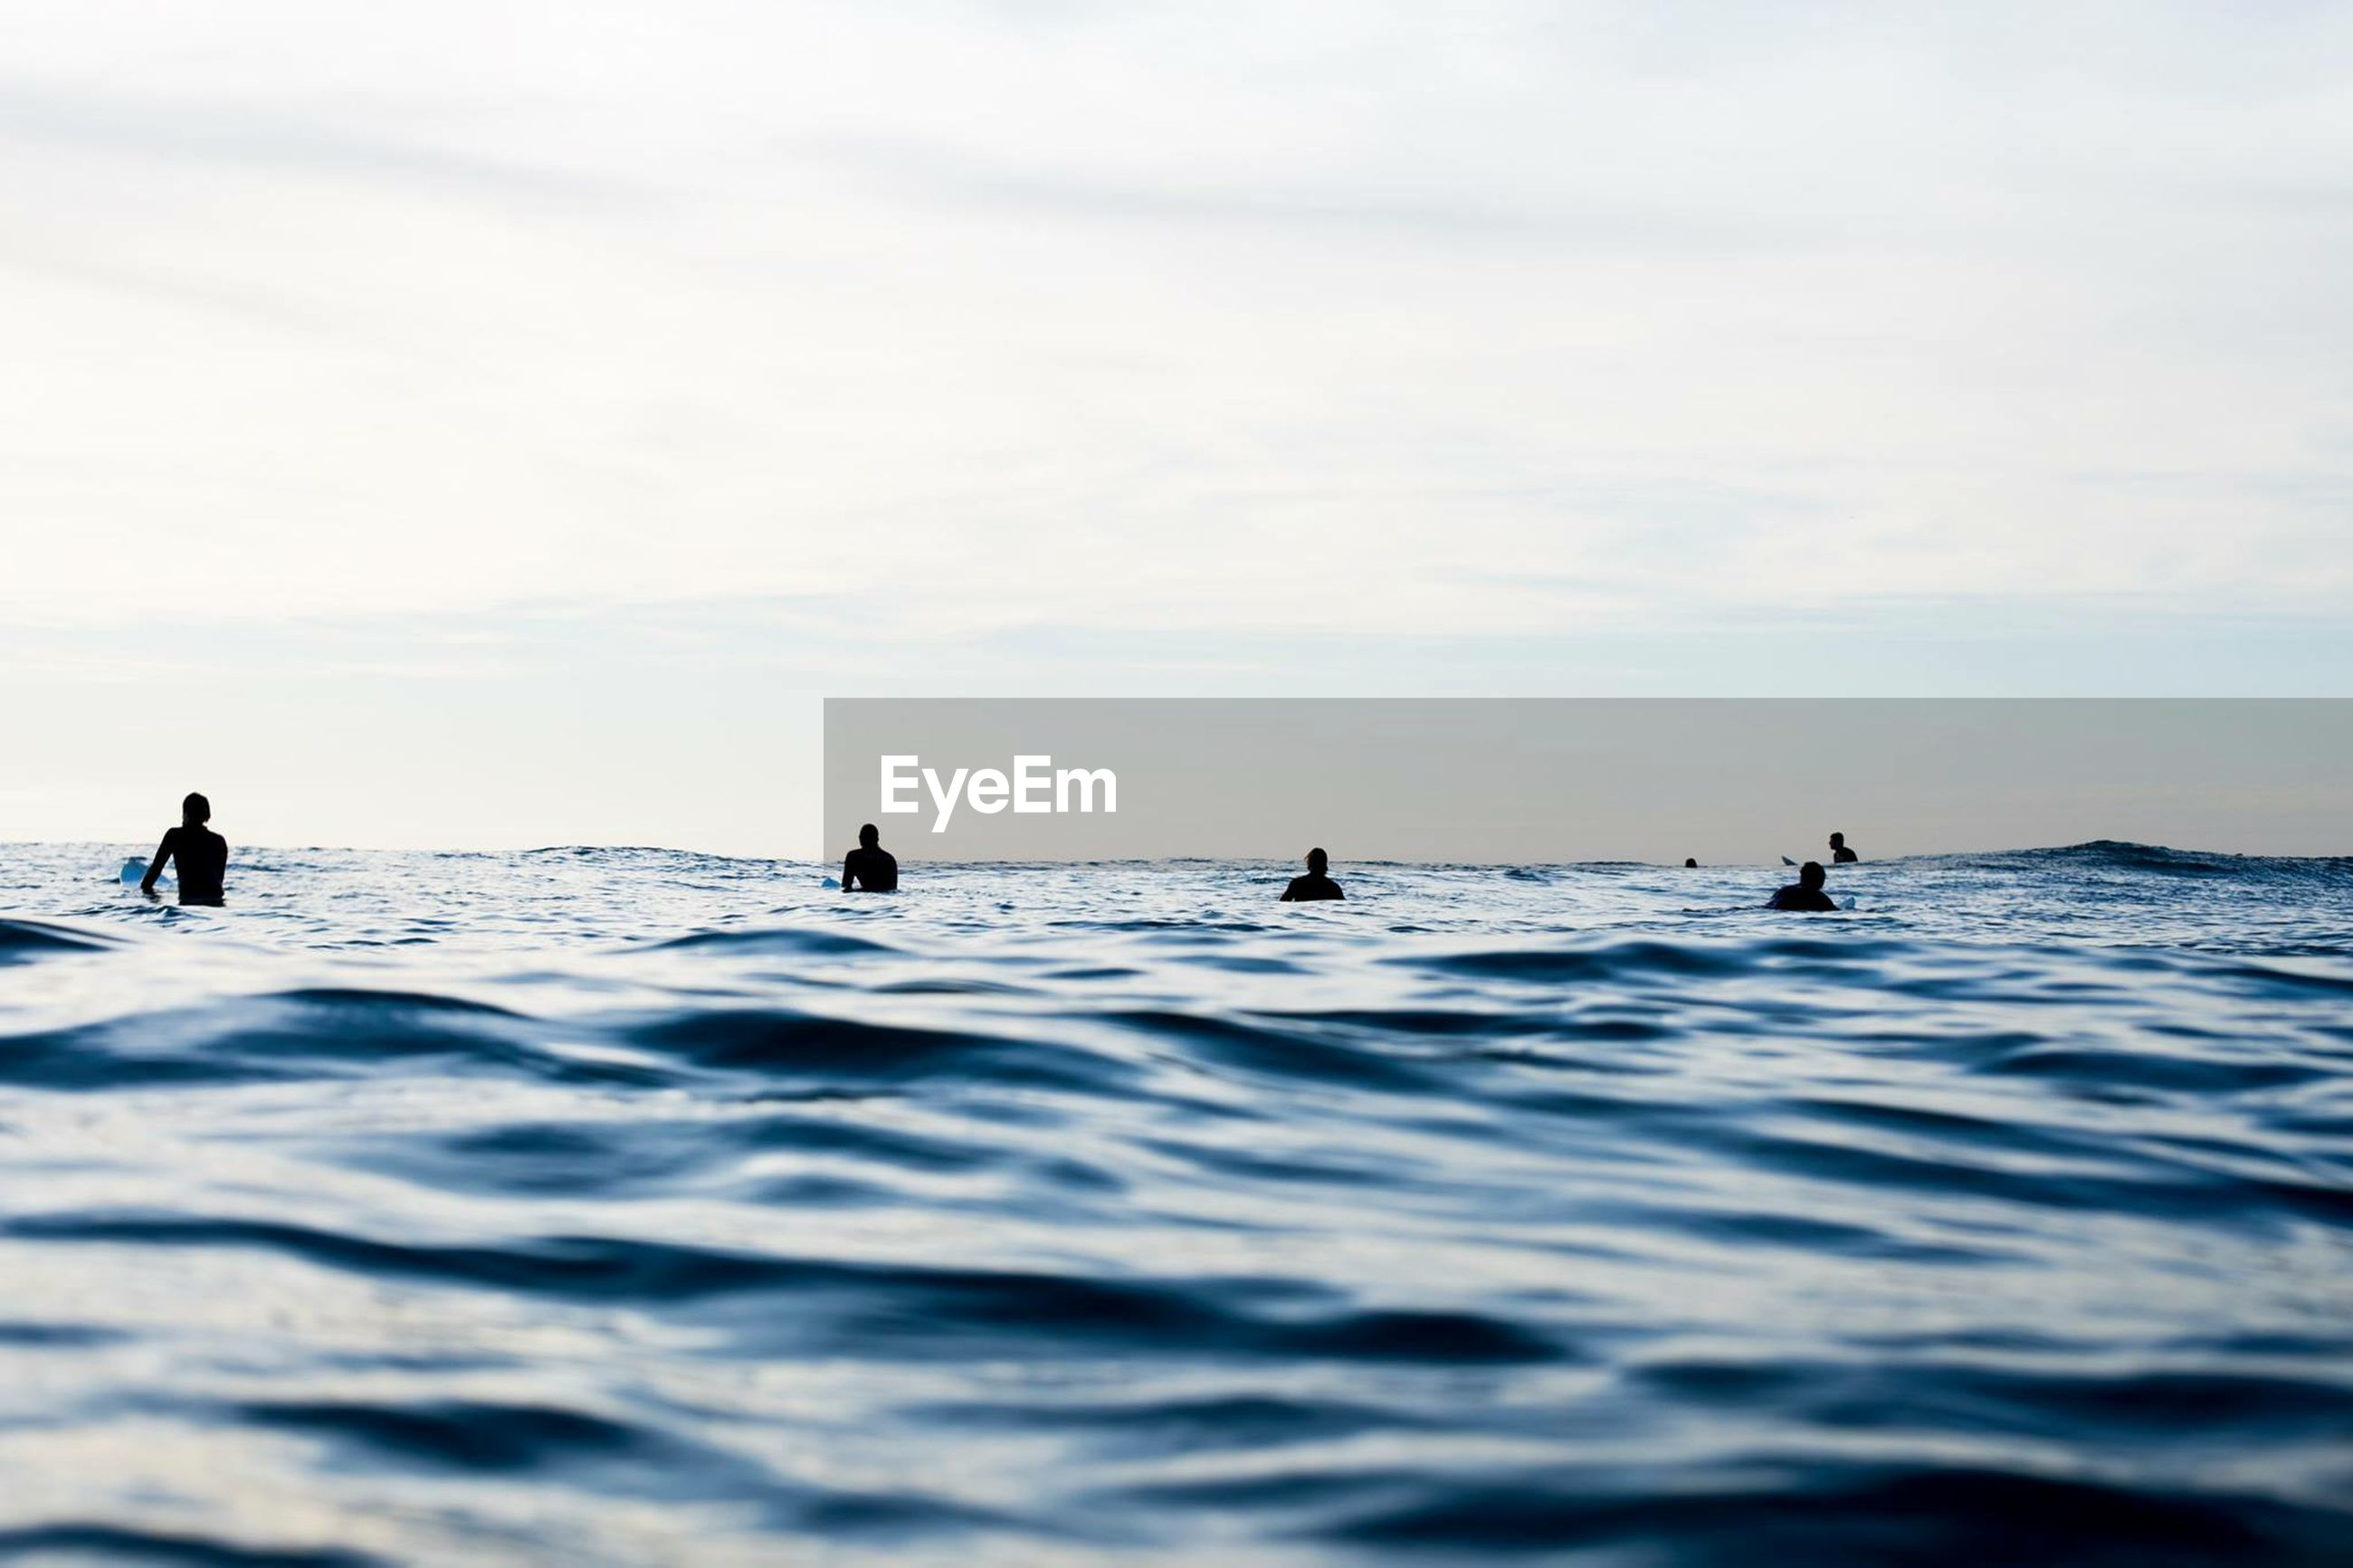 Silhouette of men surfing in sea